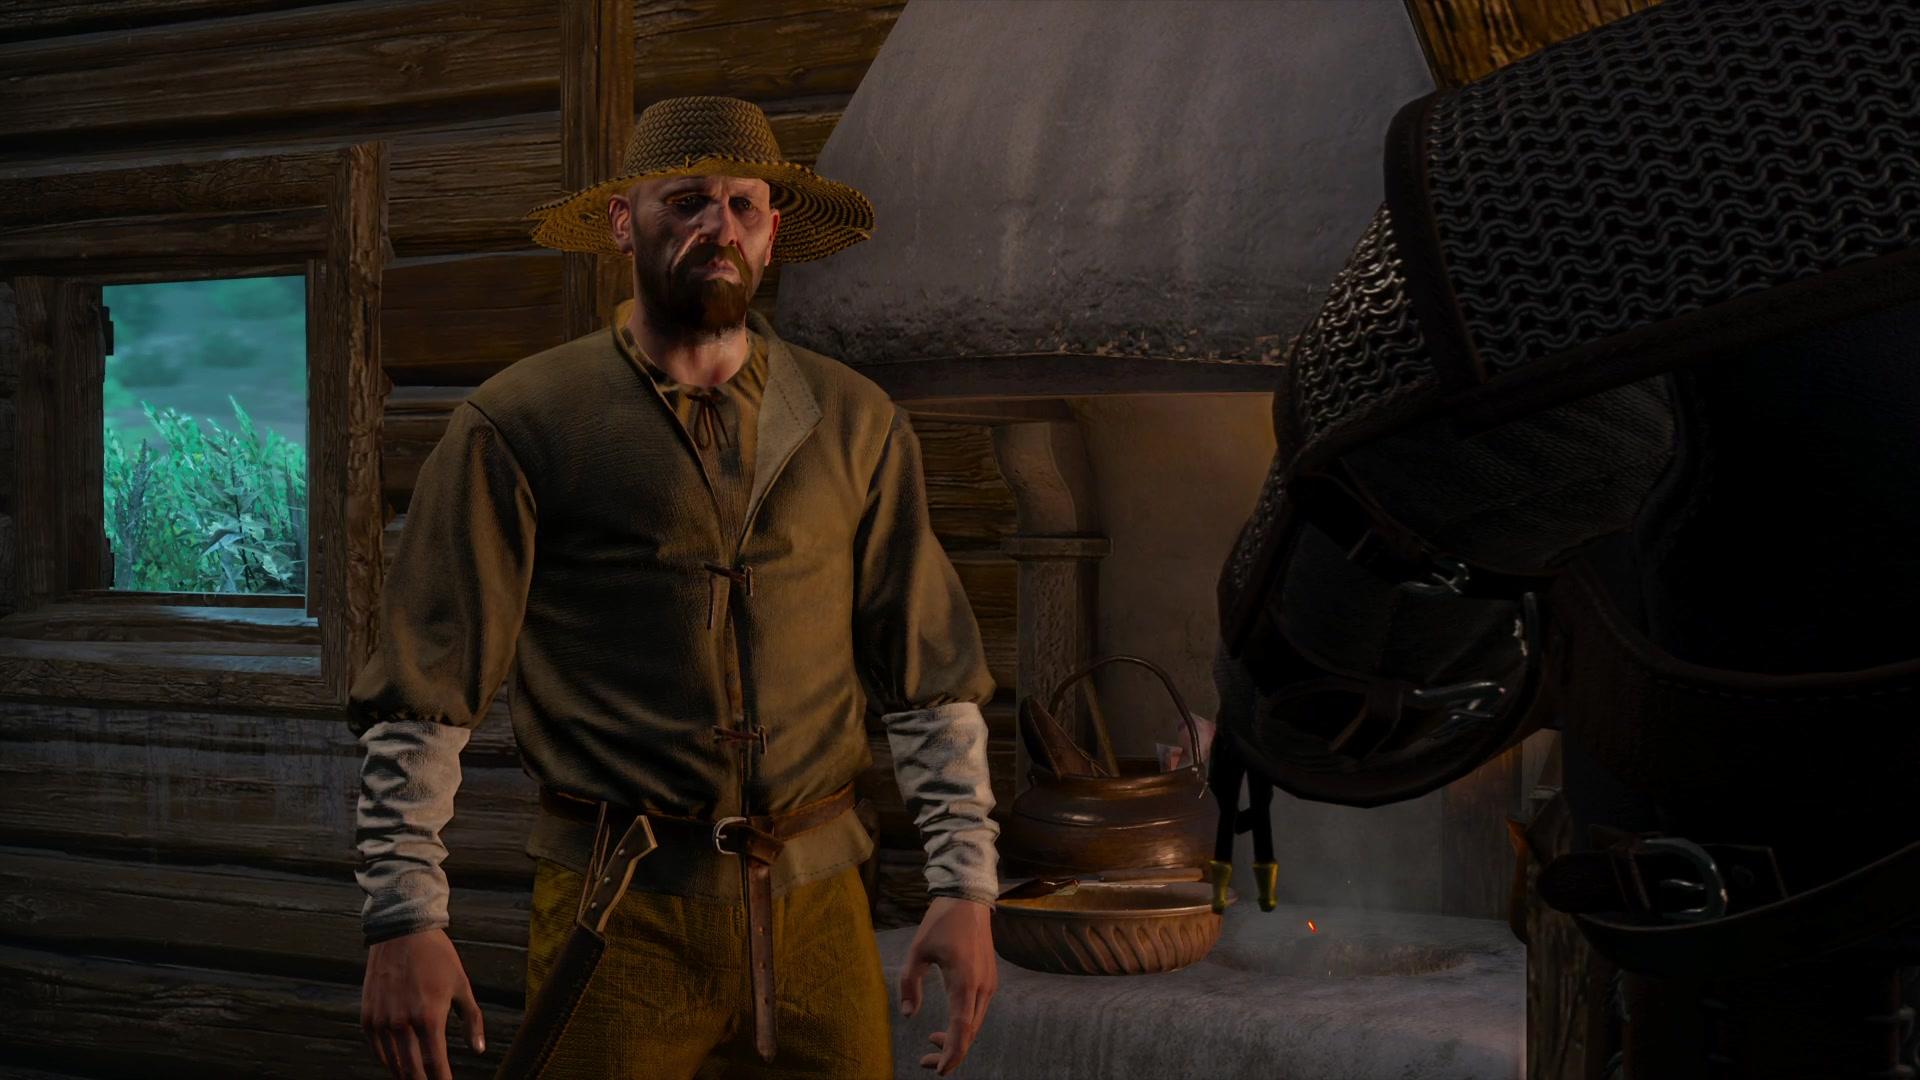 Ведьмак 3_ Дикая Охота_20180310140531 804.jpg - Witcher 3: Wild Hunt, the